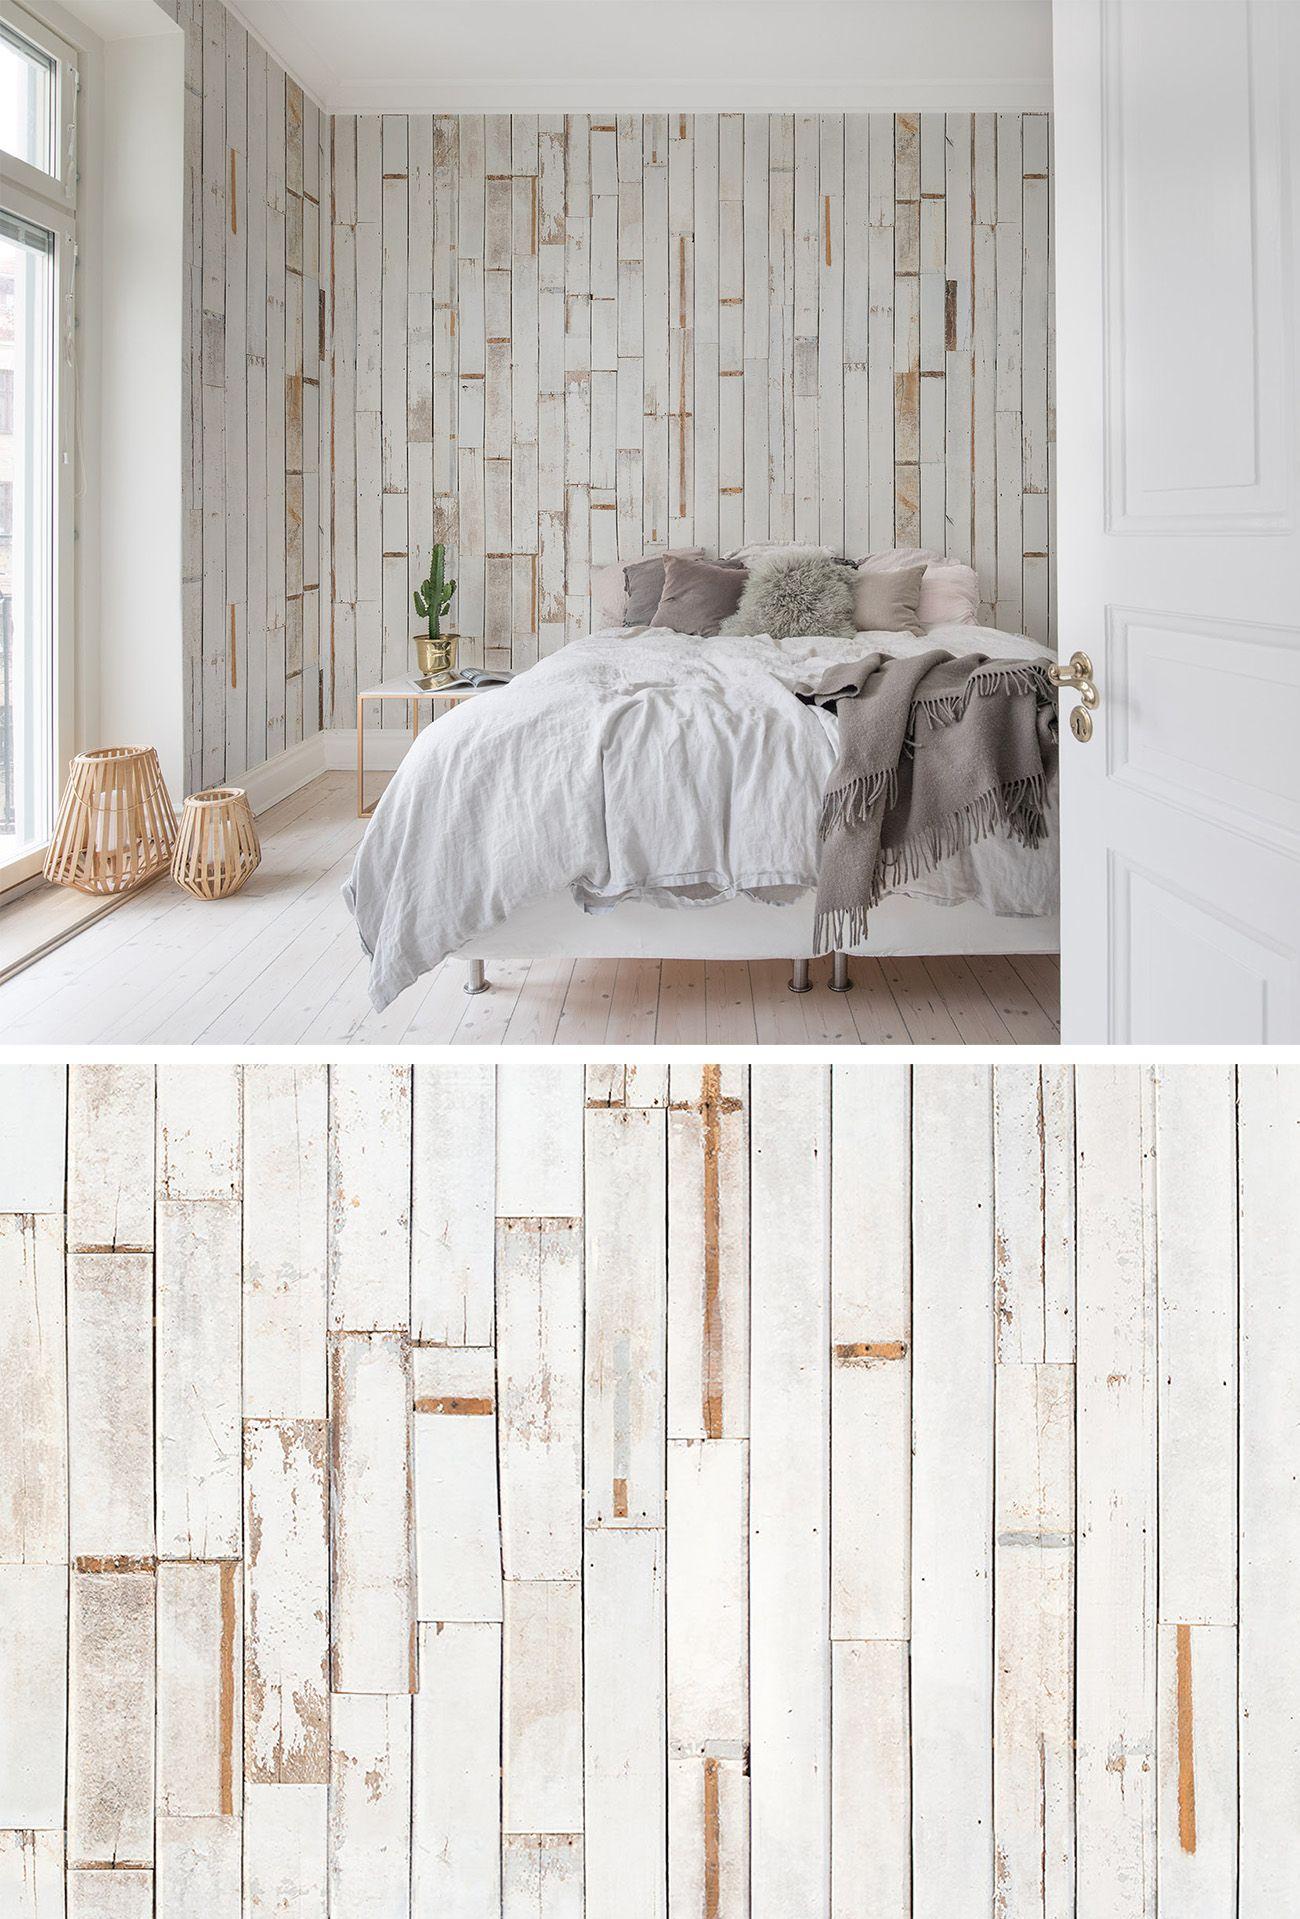 Bali boards in 2019 tapeten f r 39 s schlafzimmer for Tapete holzoptik wohnzimmer